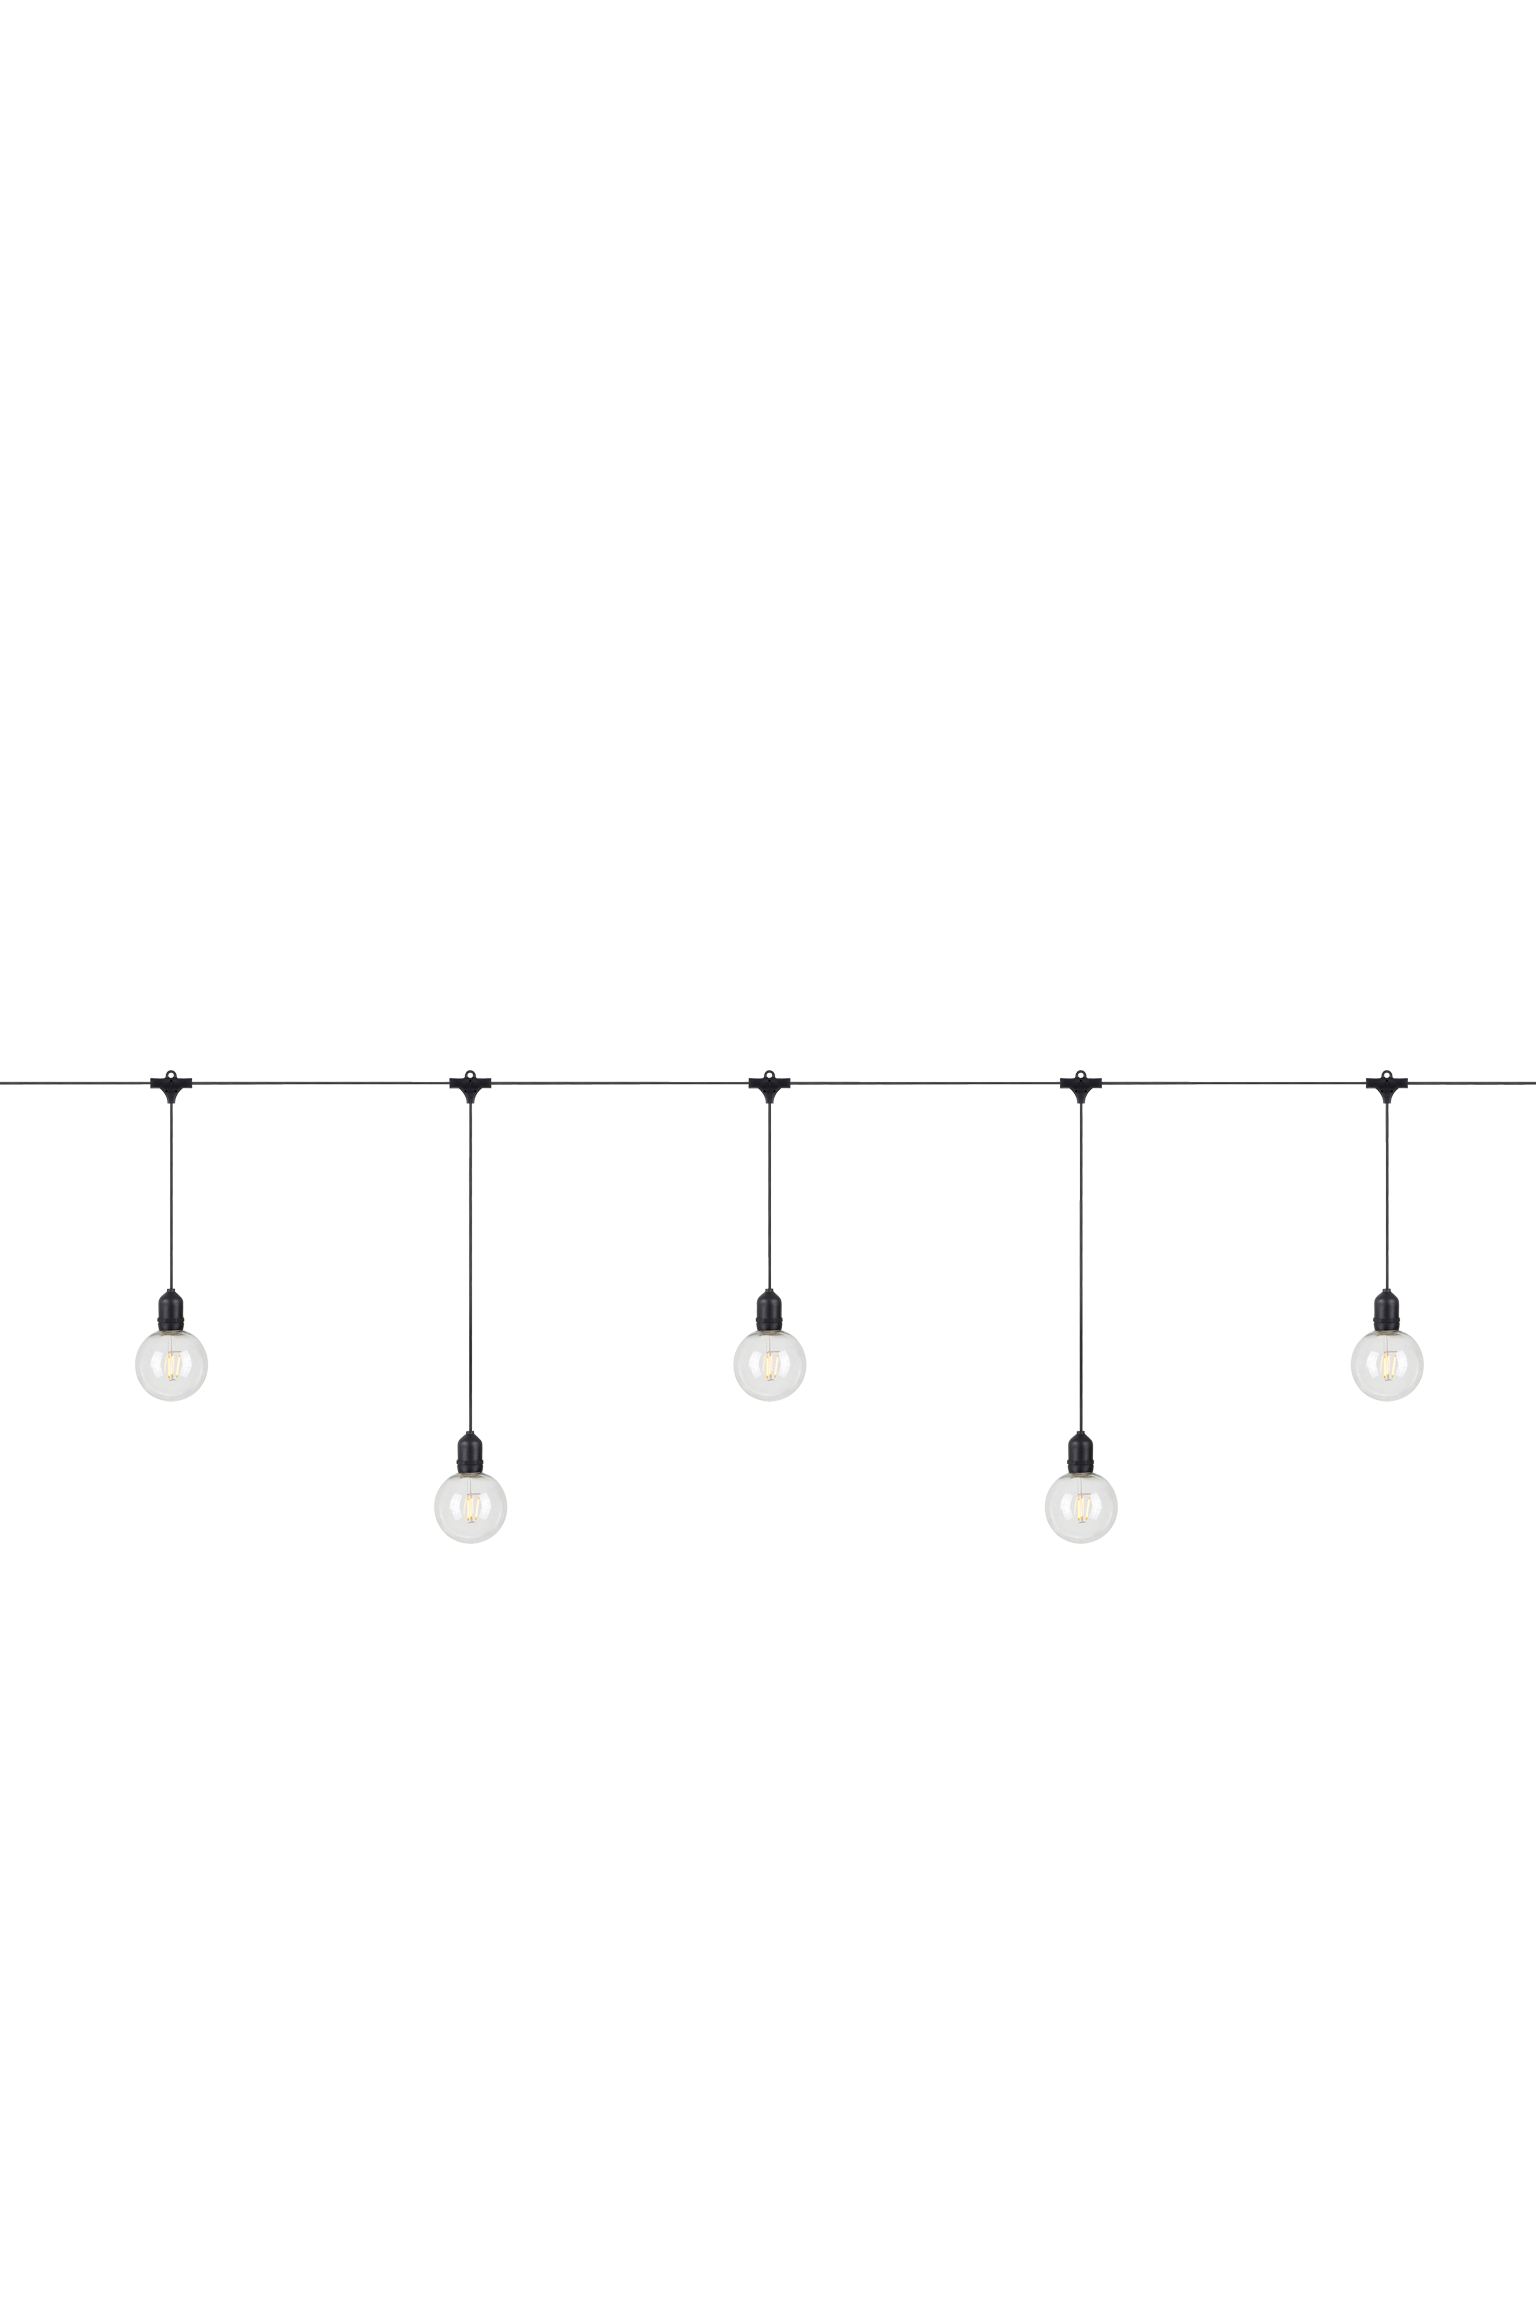 GARDEN24 Deco - EXTRA Light Chain